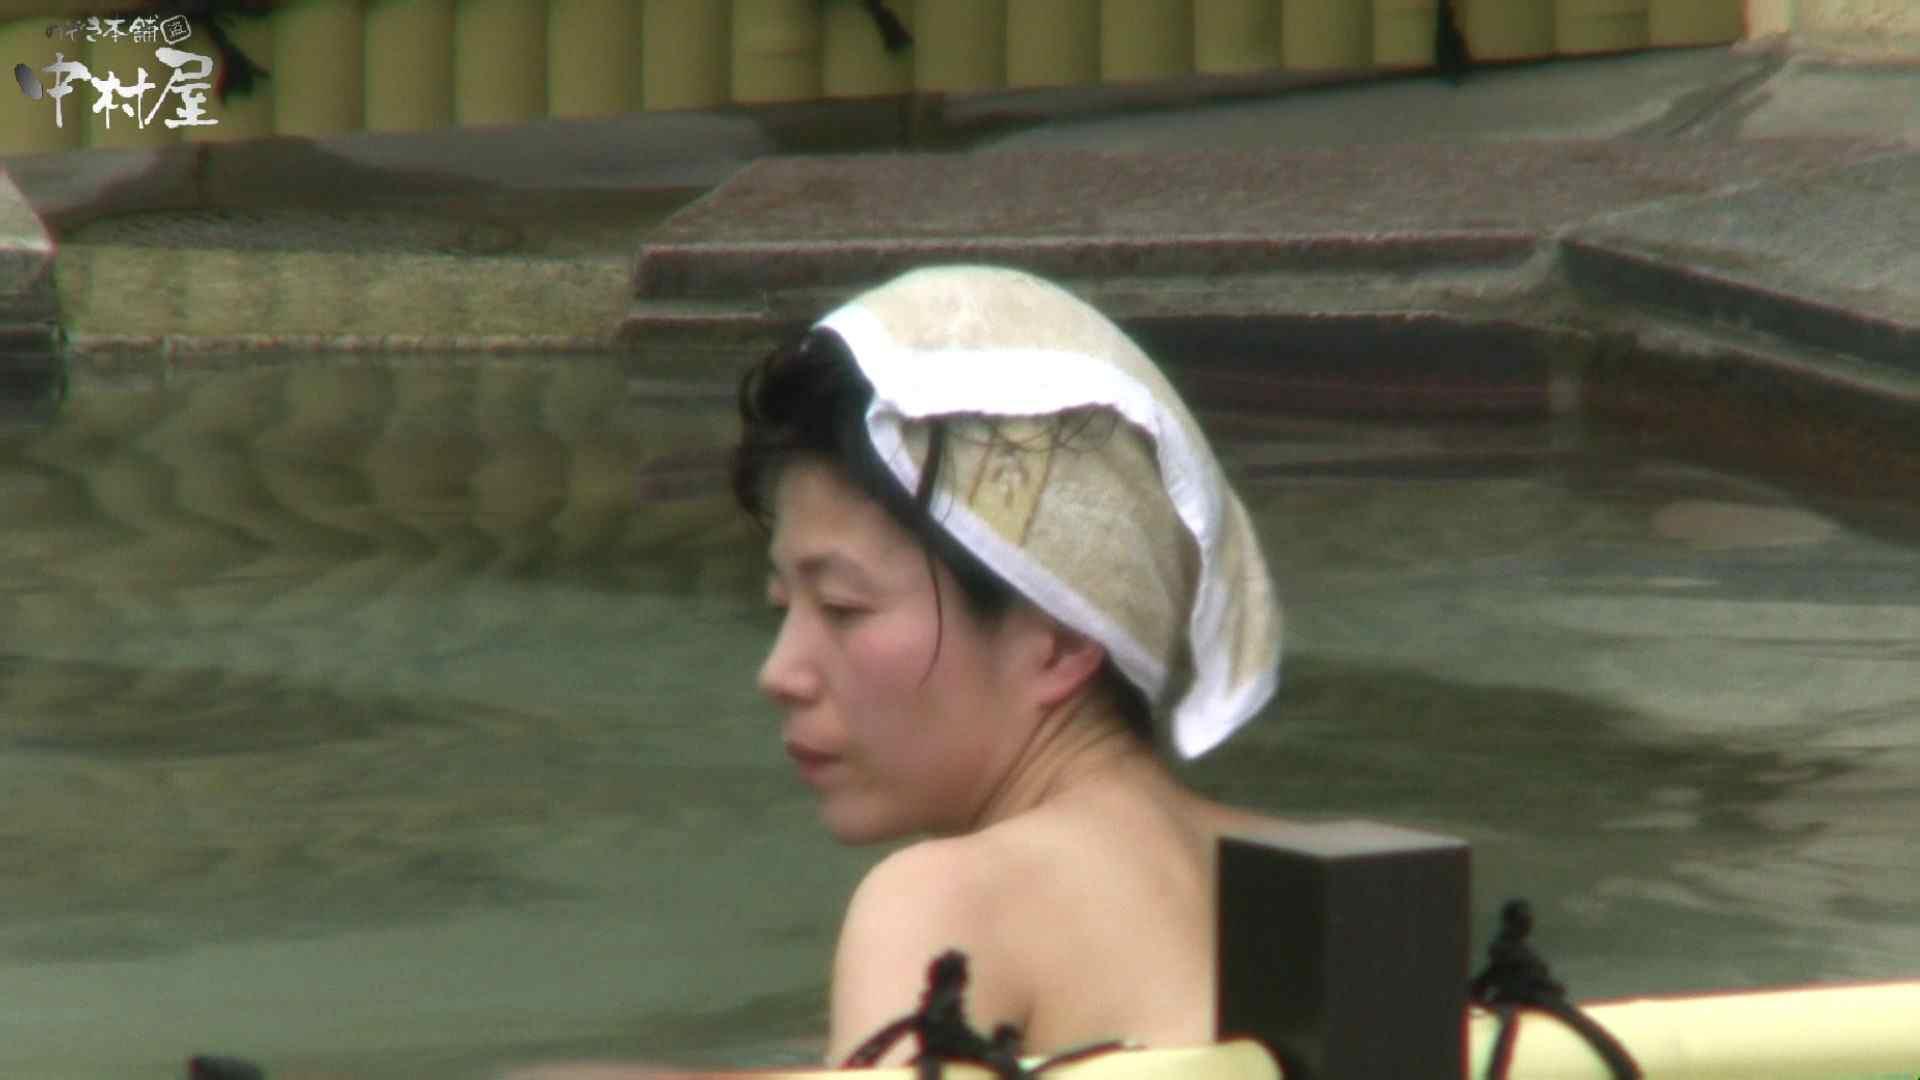 Aquaな露天風呂Vol.950 盗撮師作品 おまんこ動画流出 75pic 68